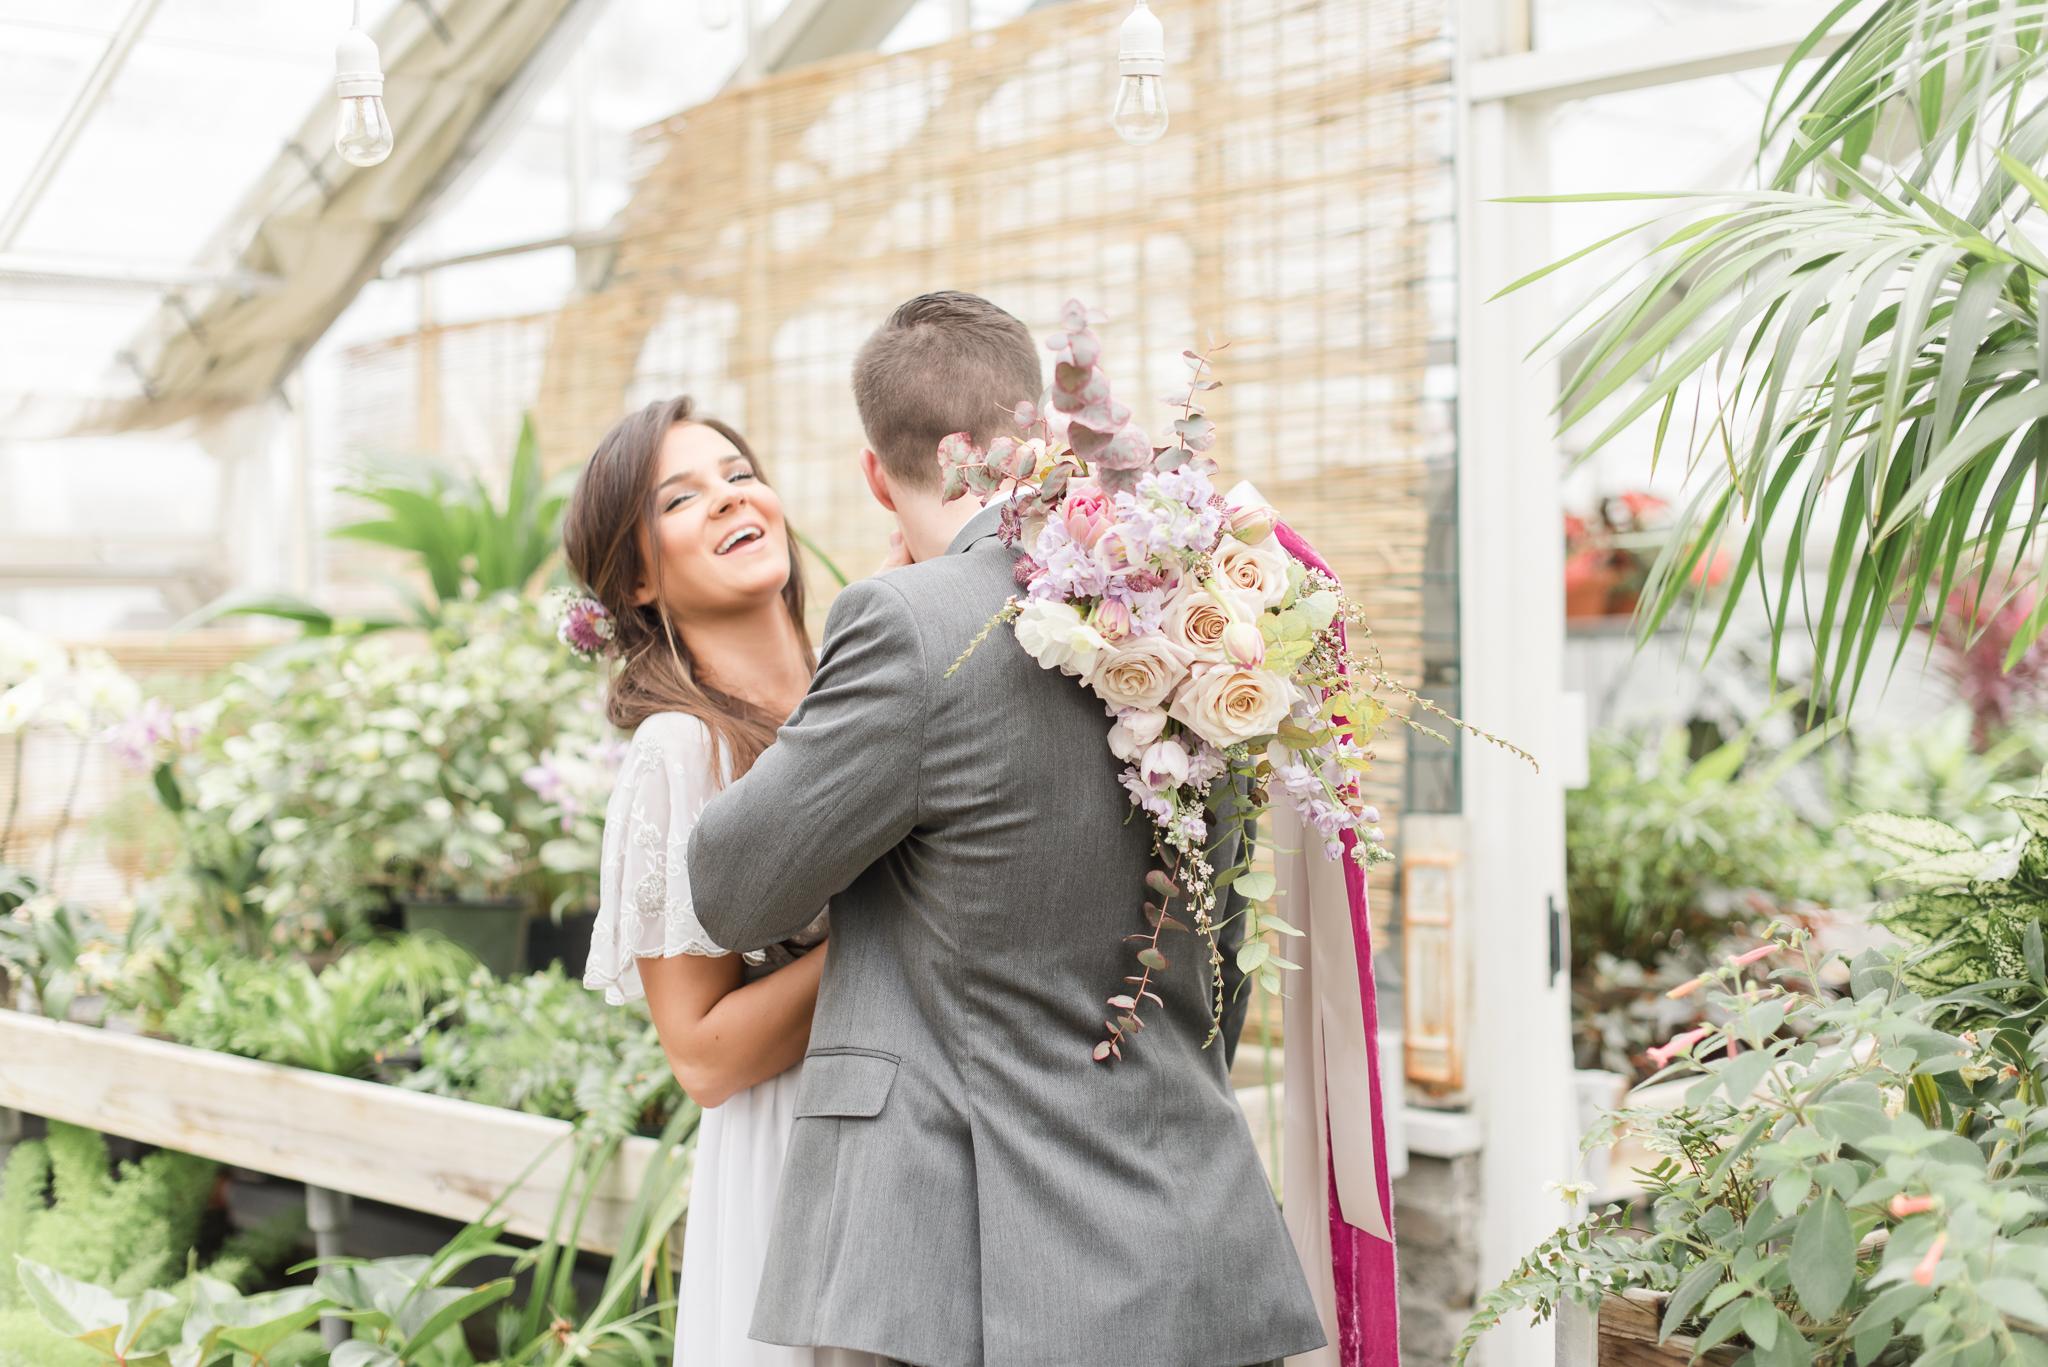 Newfields Engagement Session IMA Indianapolis Museum of Art Wedding Photos Photographer-19.jpg